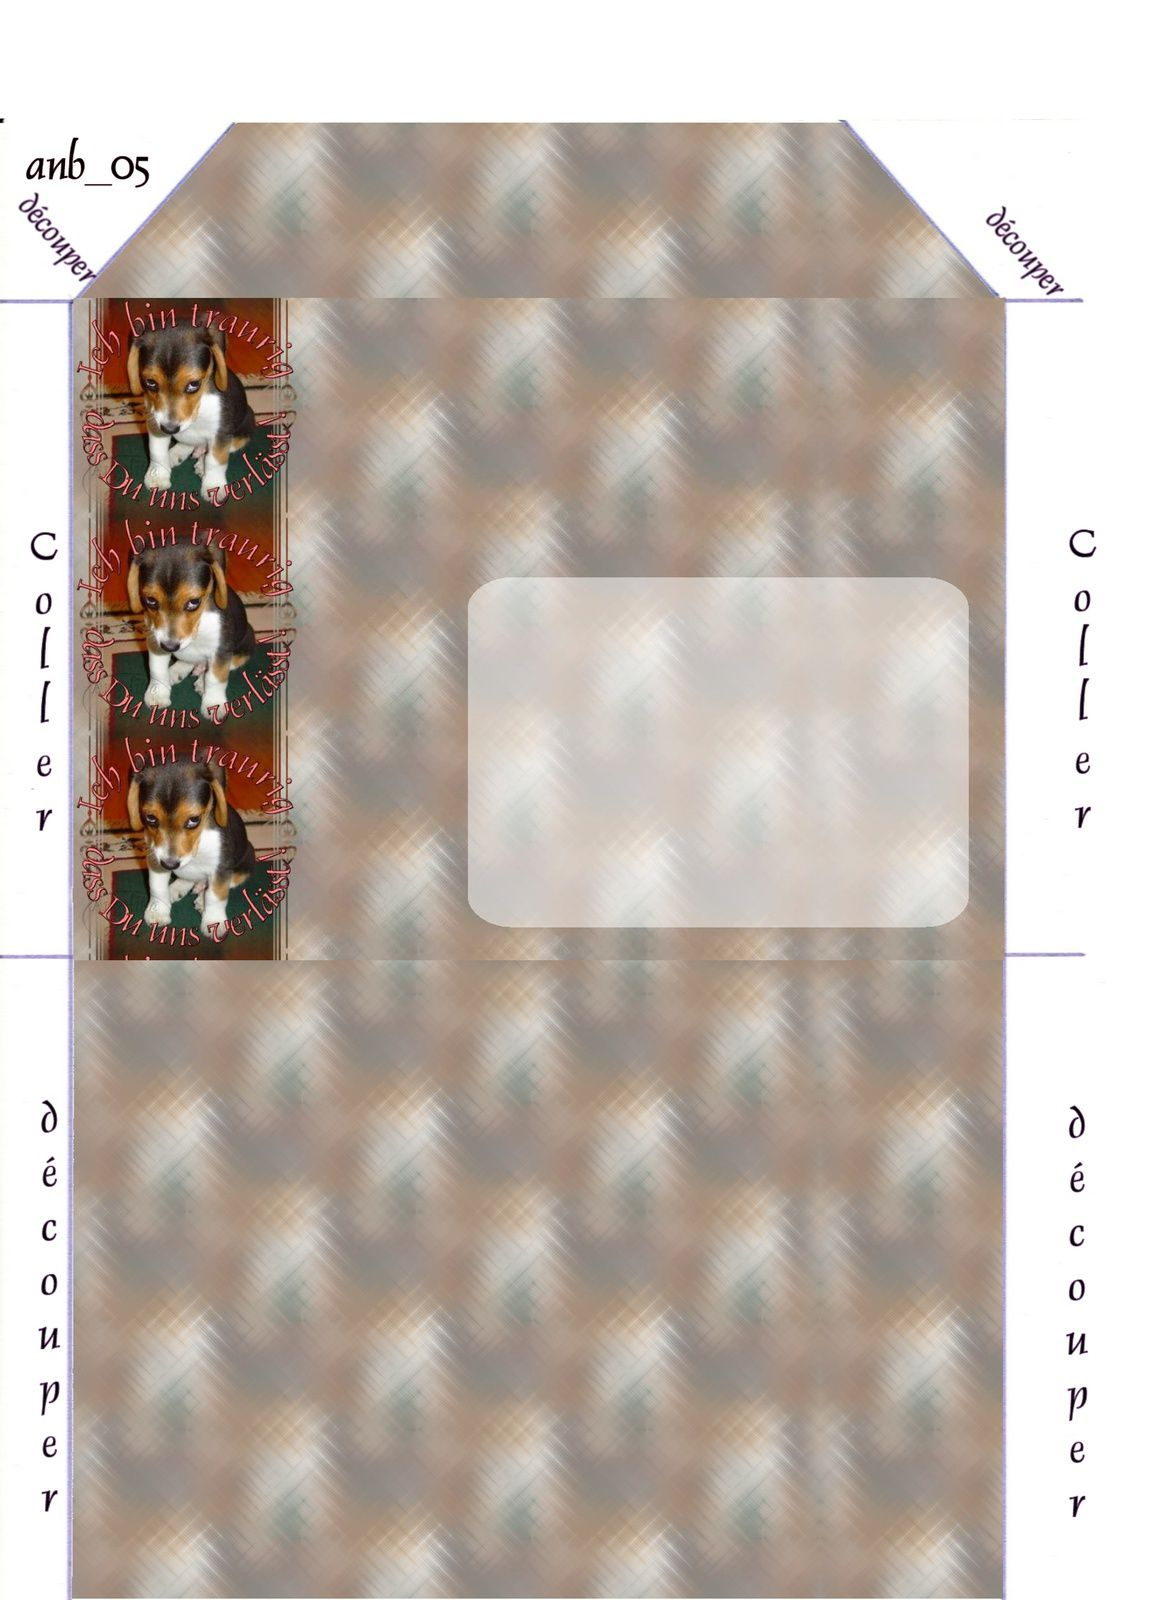 ich bin traurig dass du uns verl sst incredimail papier a4 h l outlook enveloppe 2. Black Bedroom Furniture Sets. Home Design Ideas